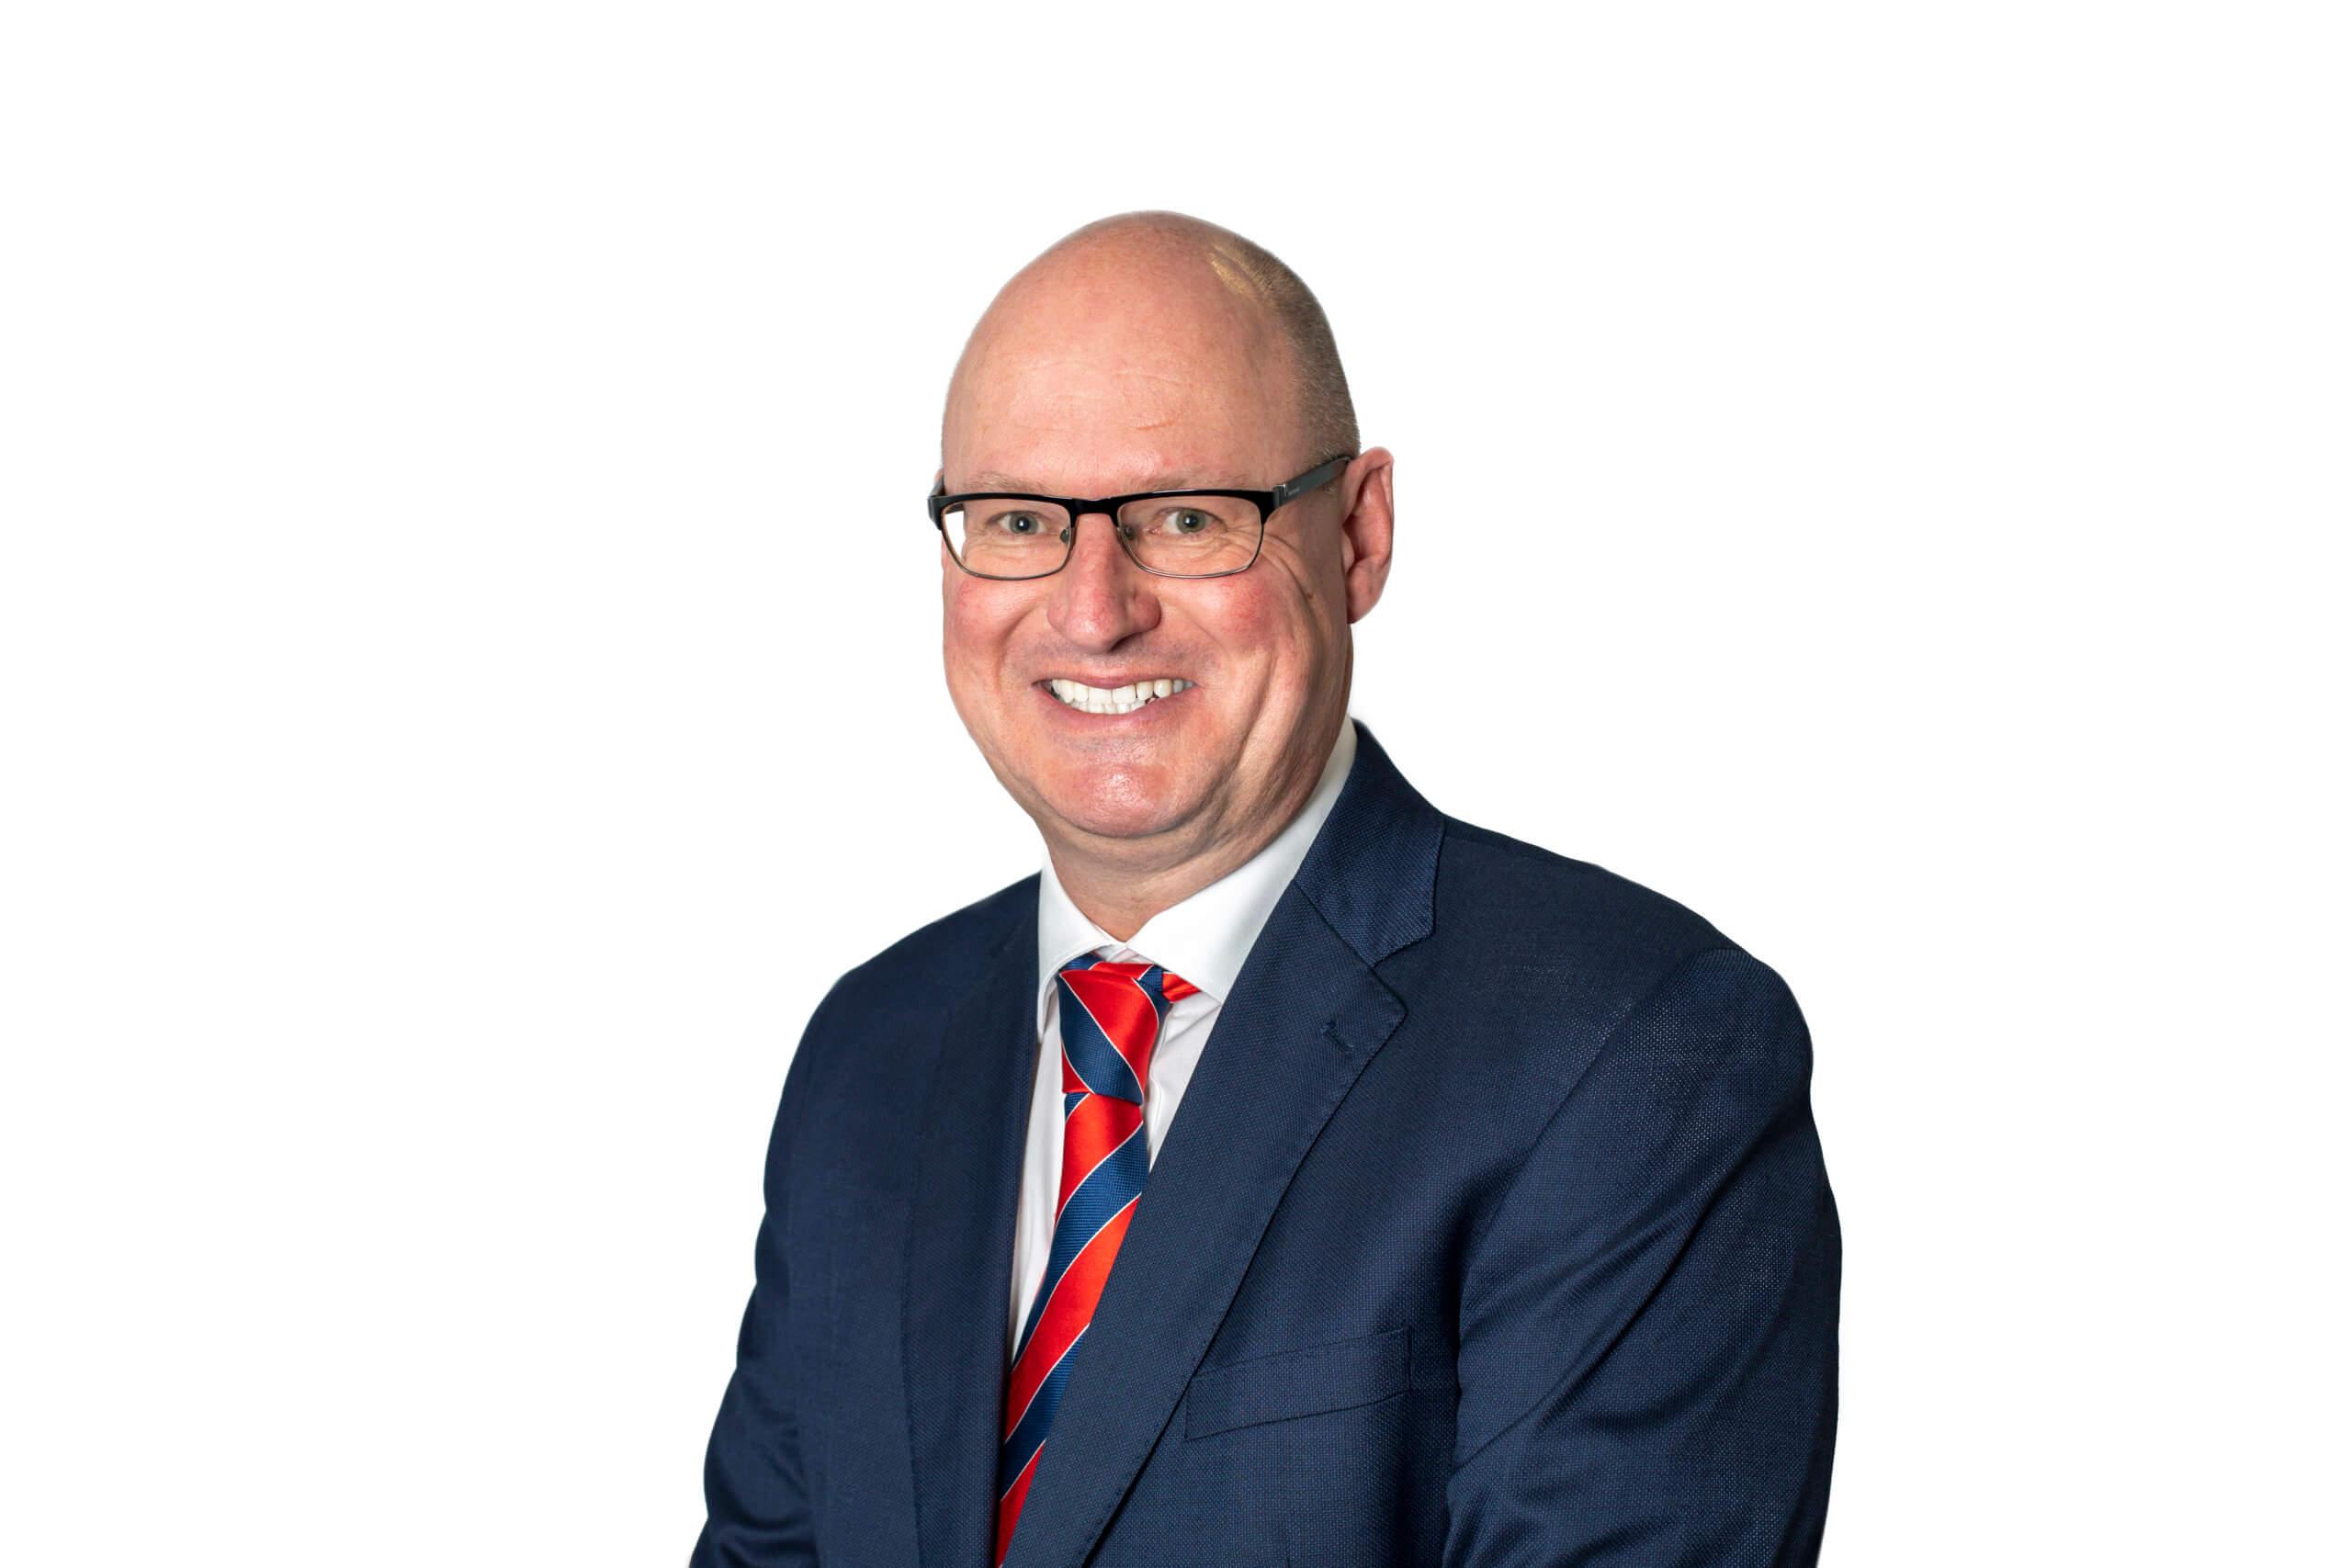 Paul Edmeades, Regional Director, Midlands